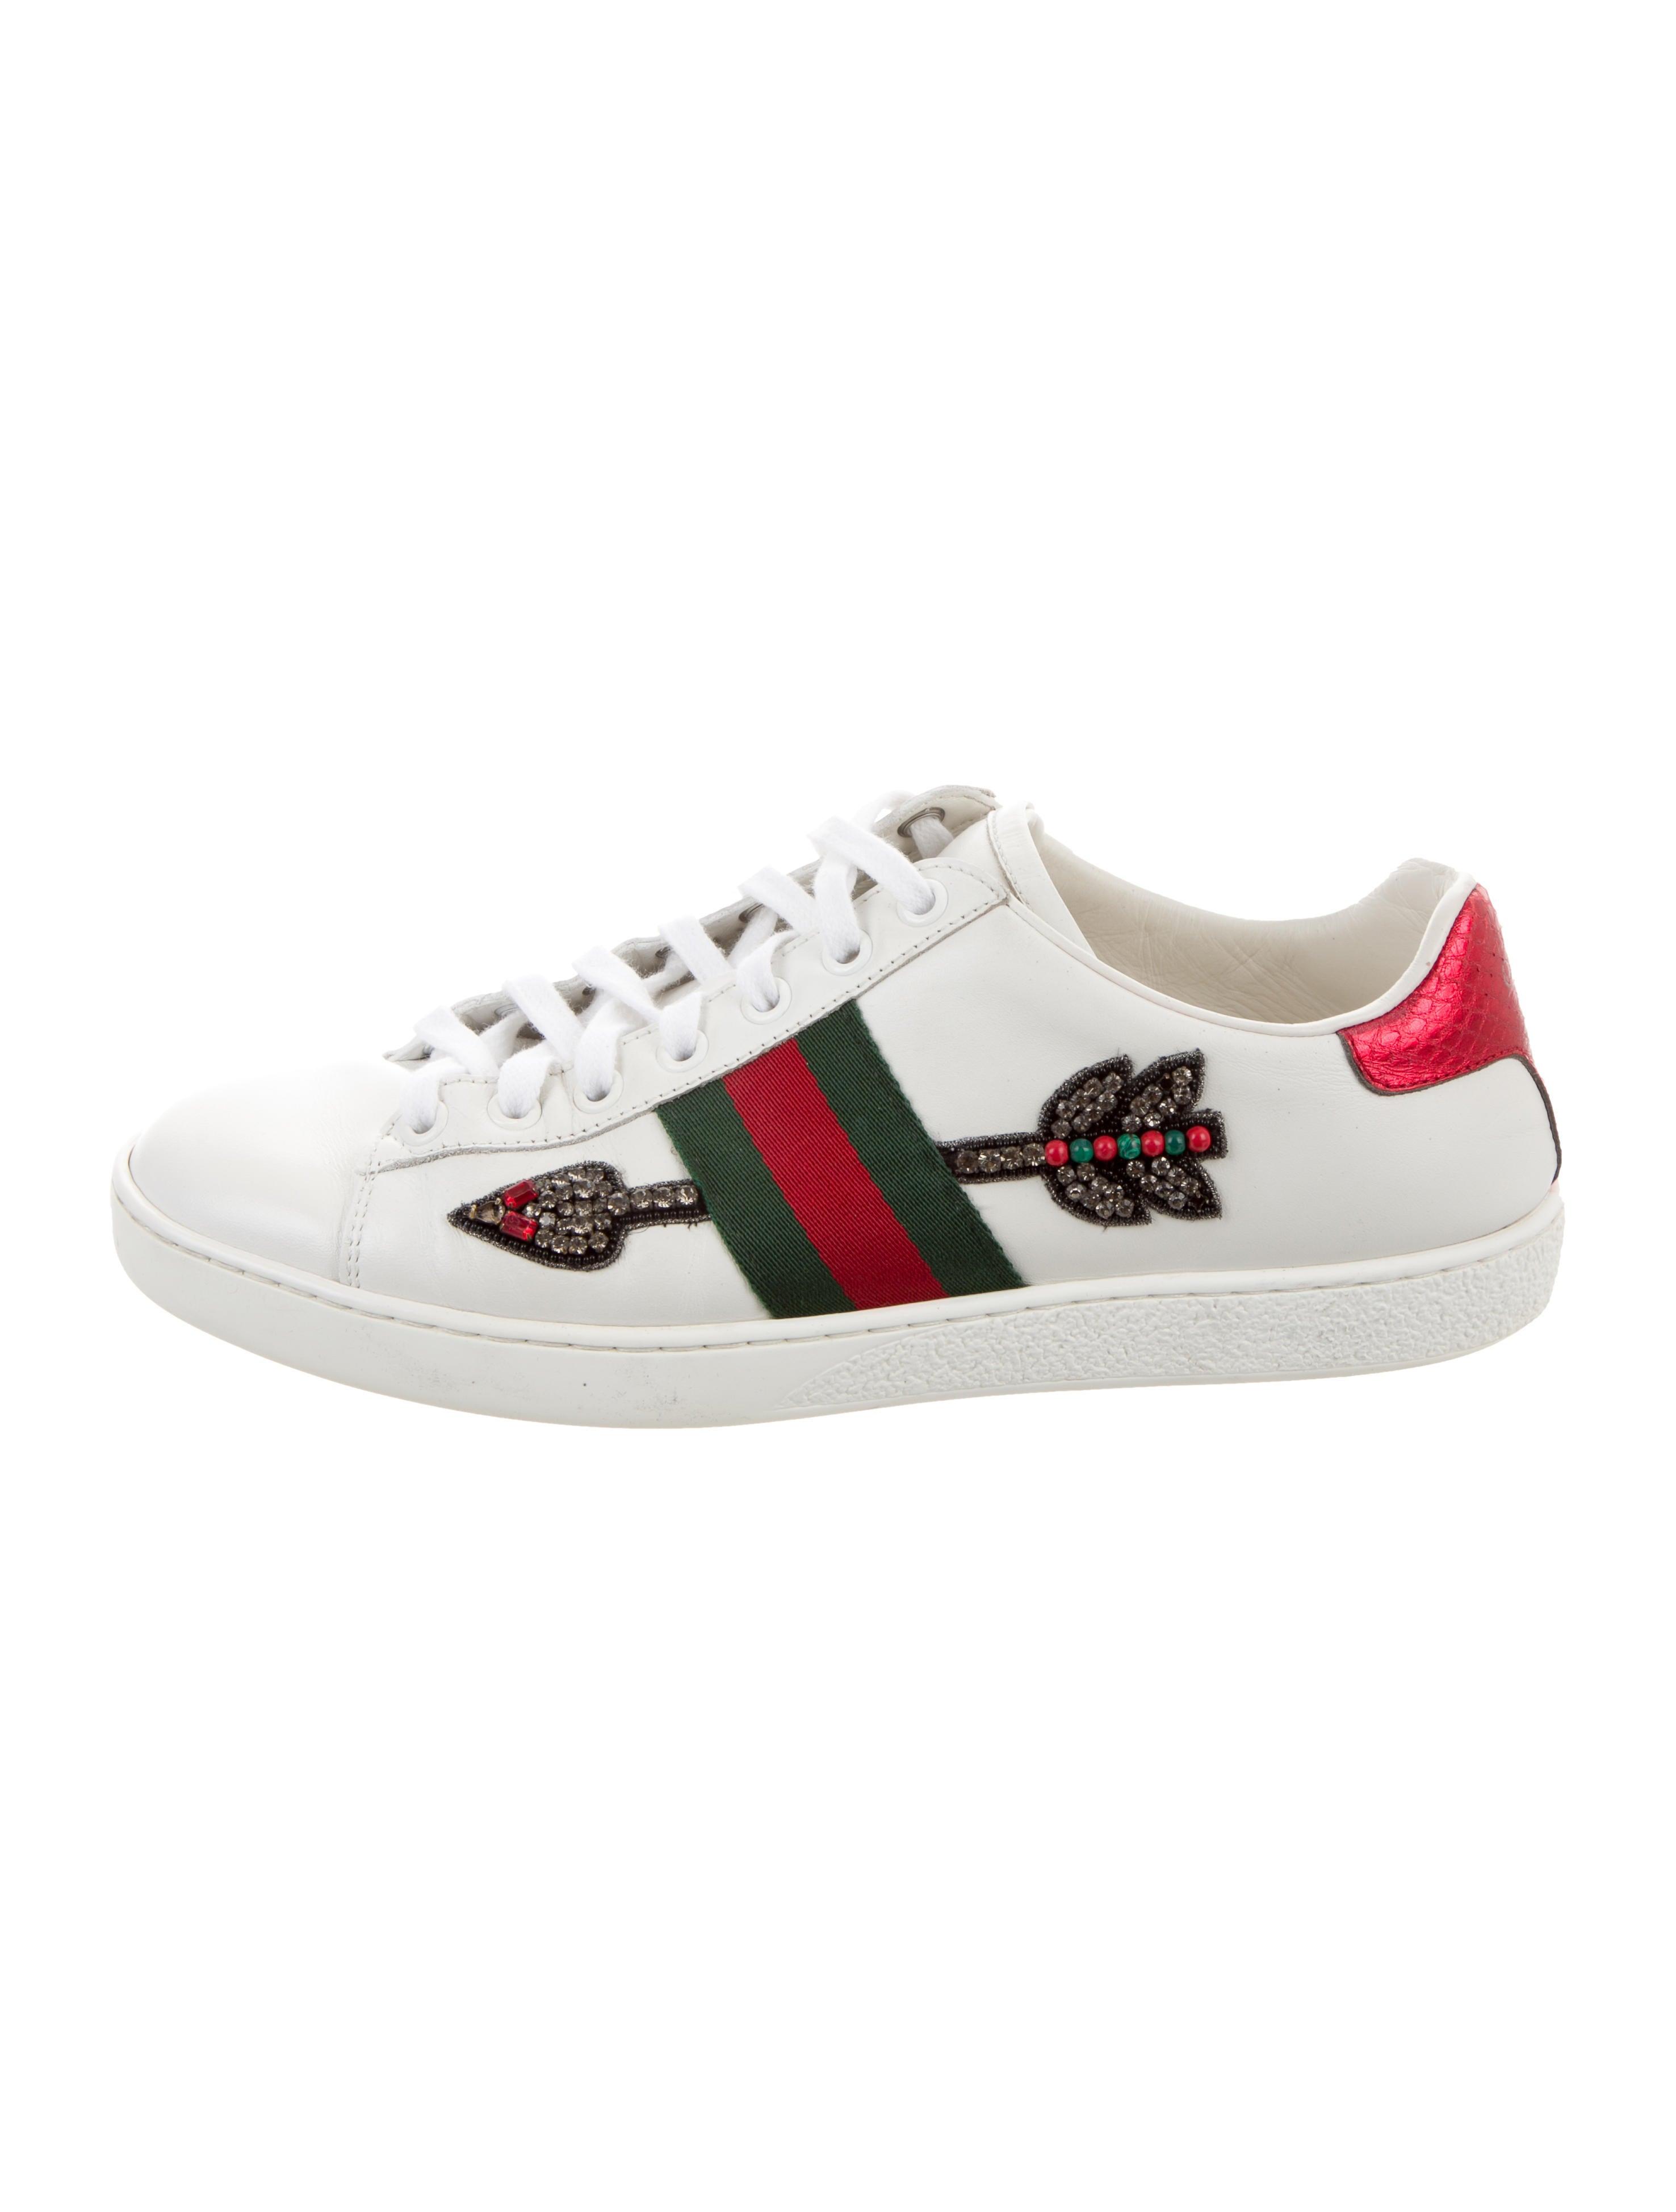 Gucci 2019 Bleeding Arrow Ace Sneakers